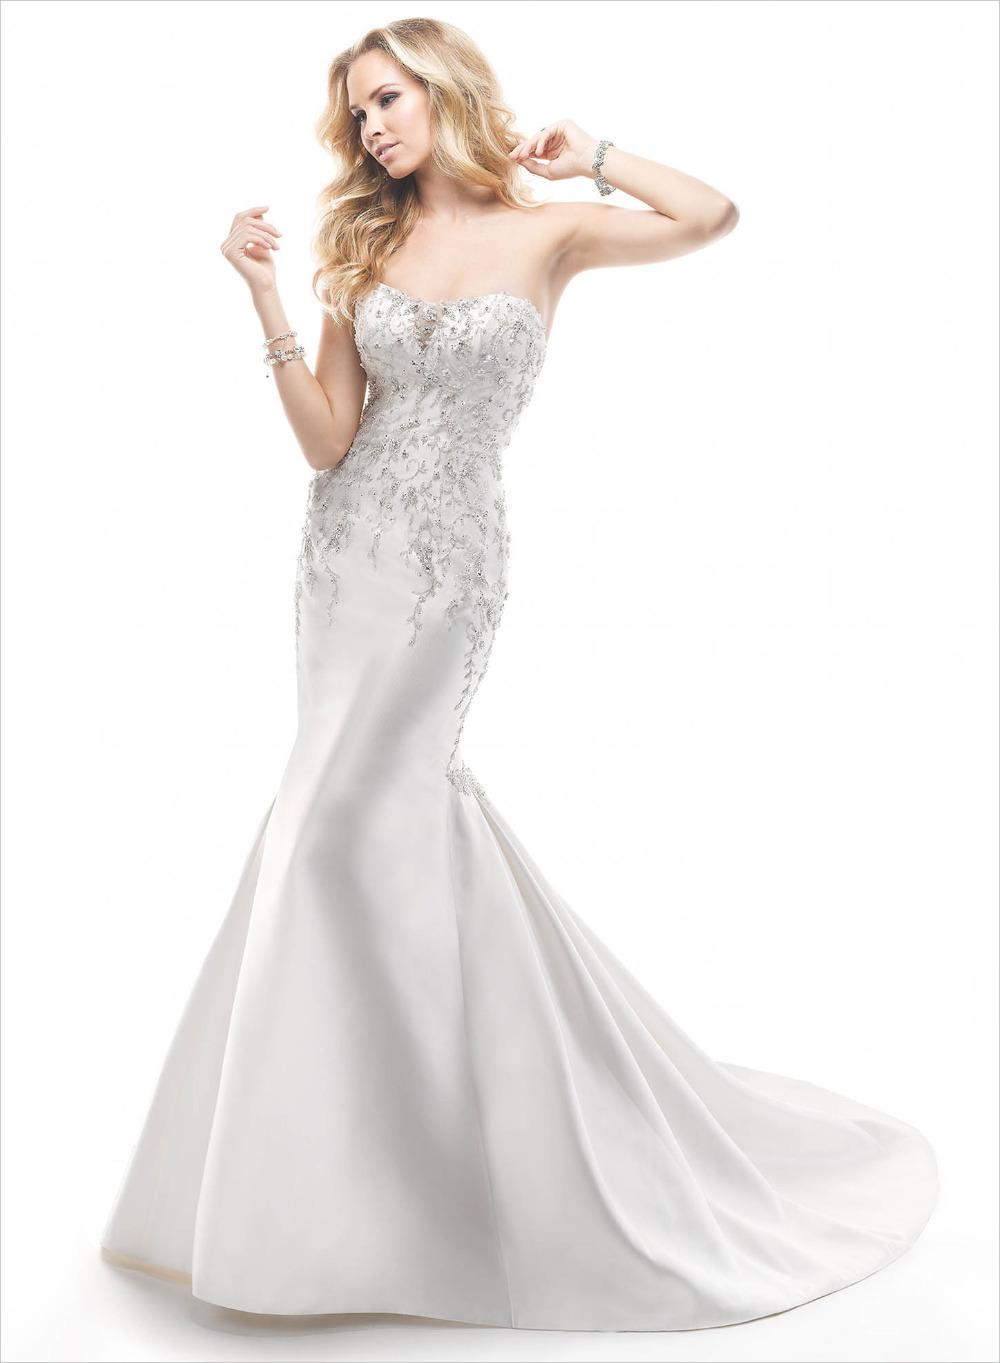 Custom-madeNew listing on the 2014 air quality mermaid wedding dress high fashion elegant strapless beaded sleeveless(China (Mainland))